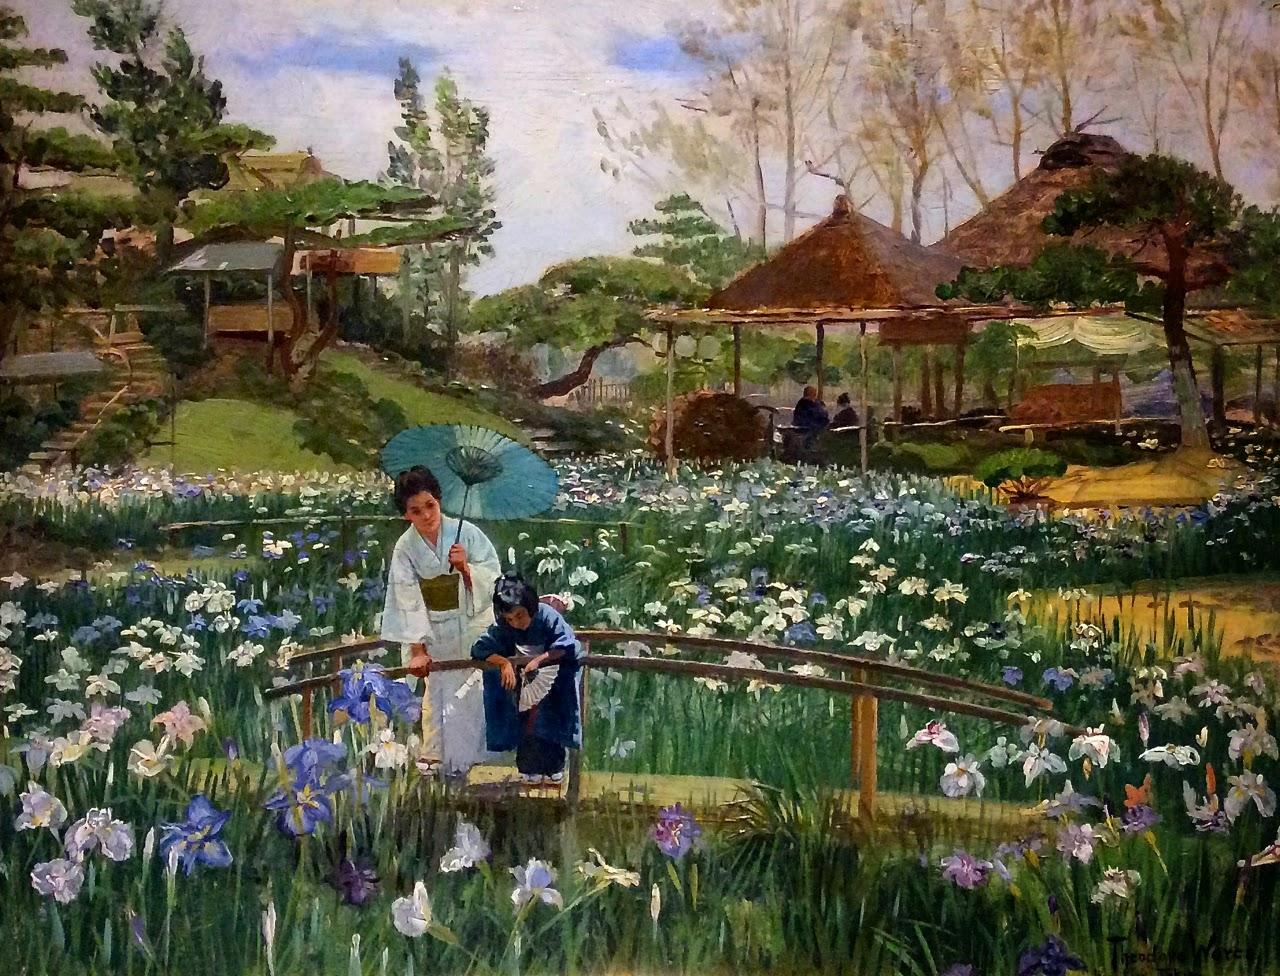 Filethe Iris Flowers Of Hori Kiri Tokio By Theodore Woresg